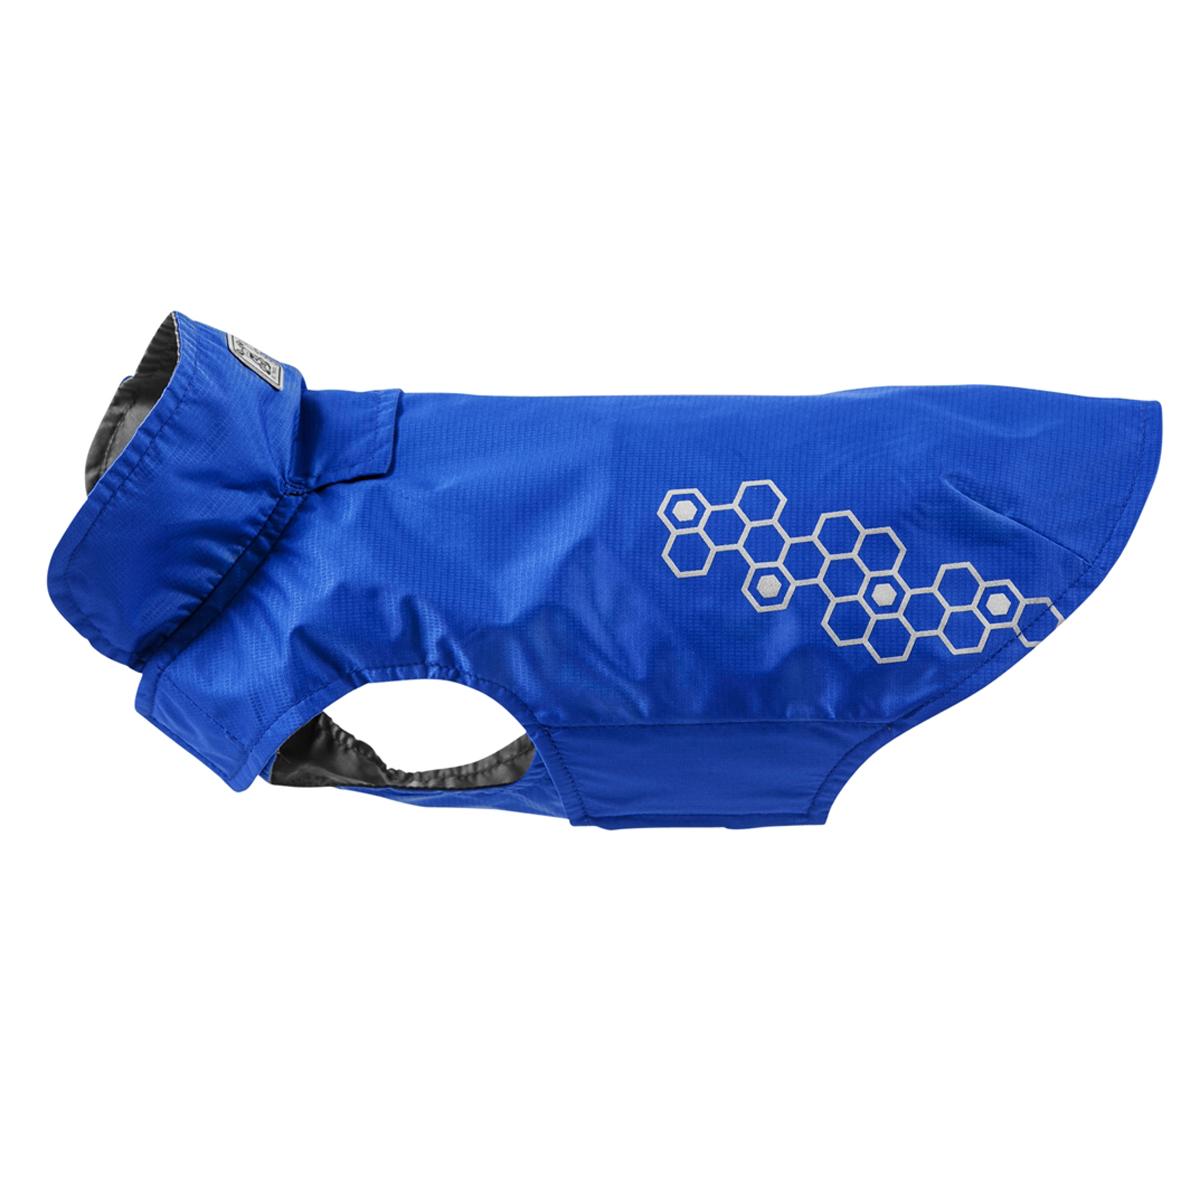 Venture Shell Slicker Dog Jacket - Electric Blue